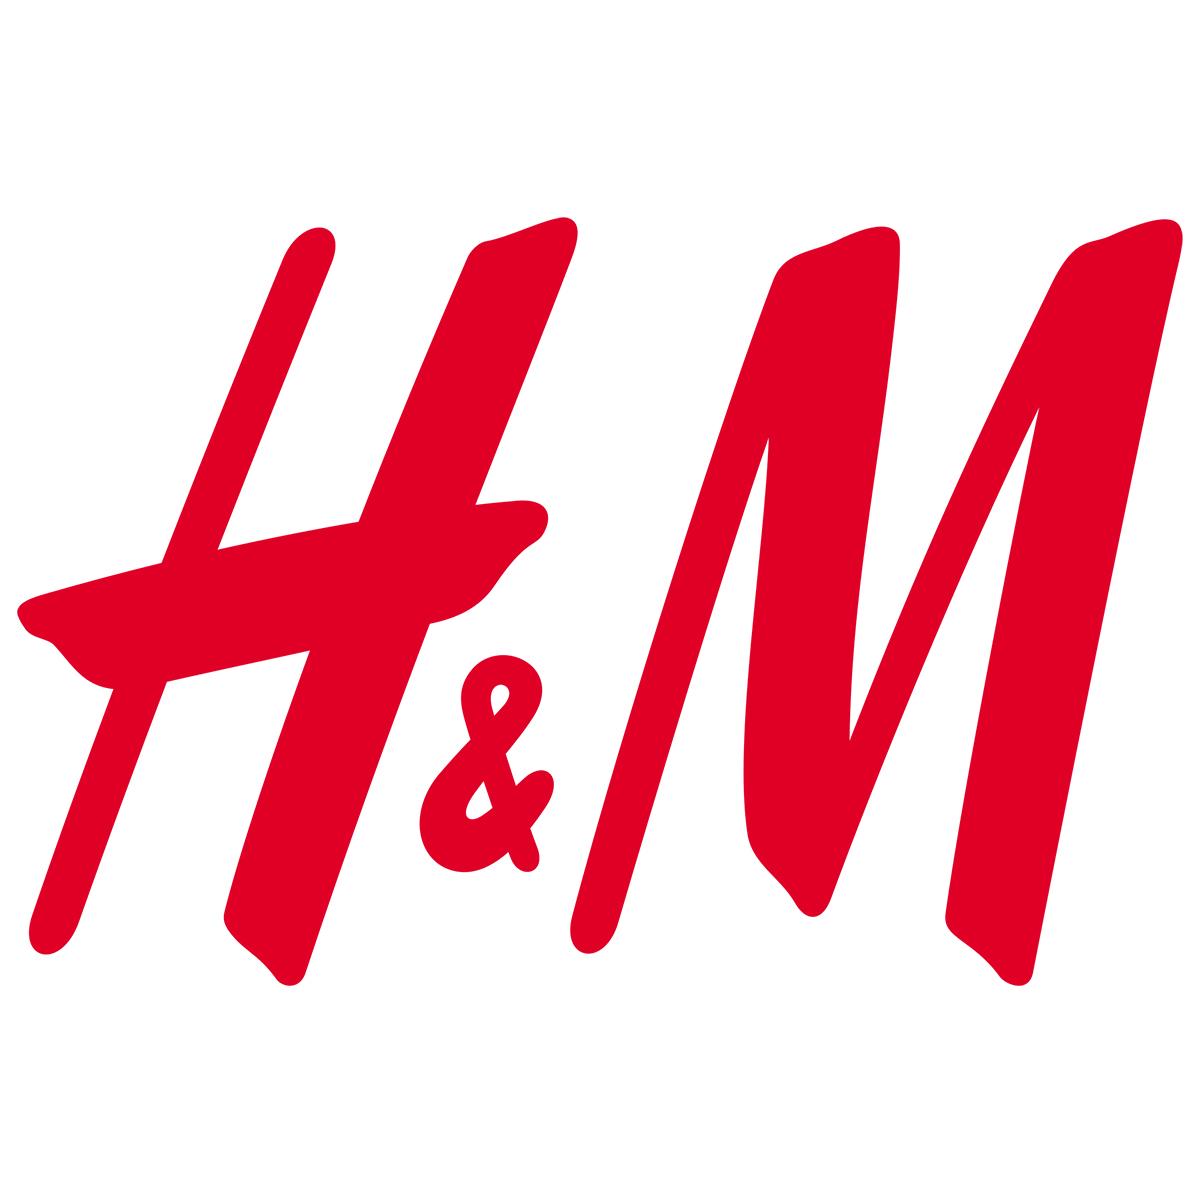 Cushman & Wakefield Korea Retail hub